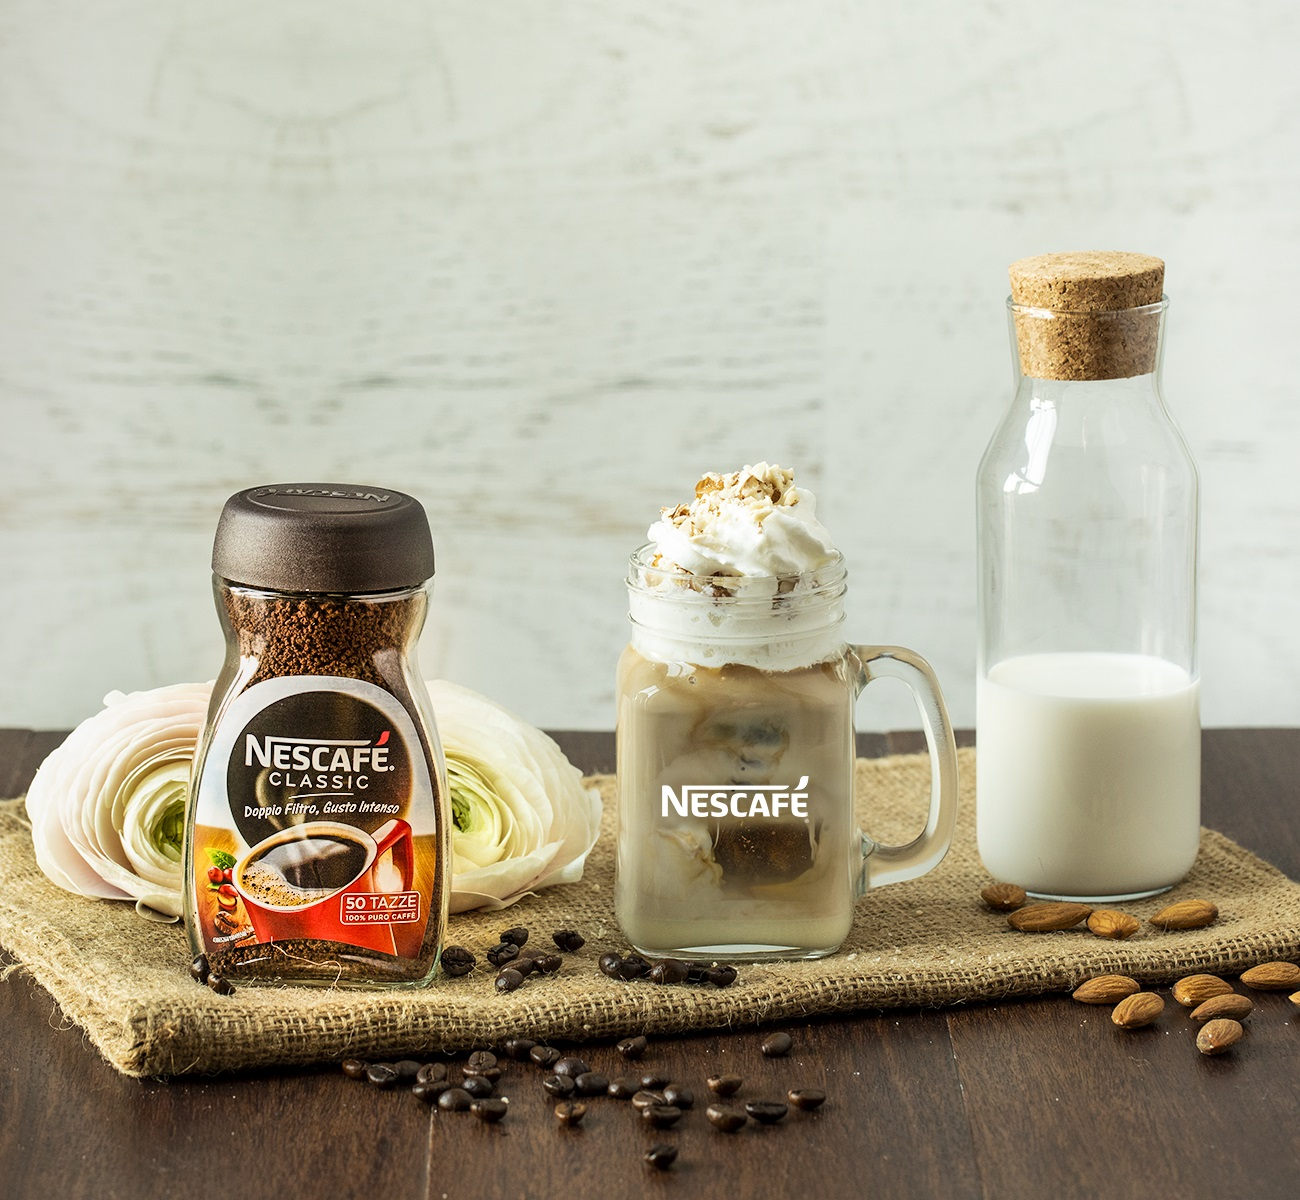 Nescafé estate